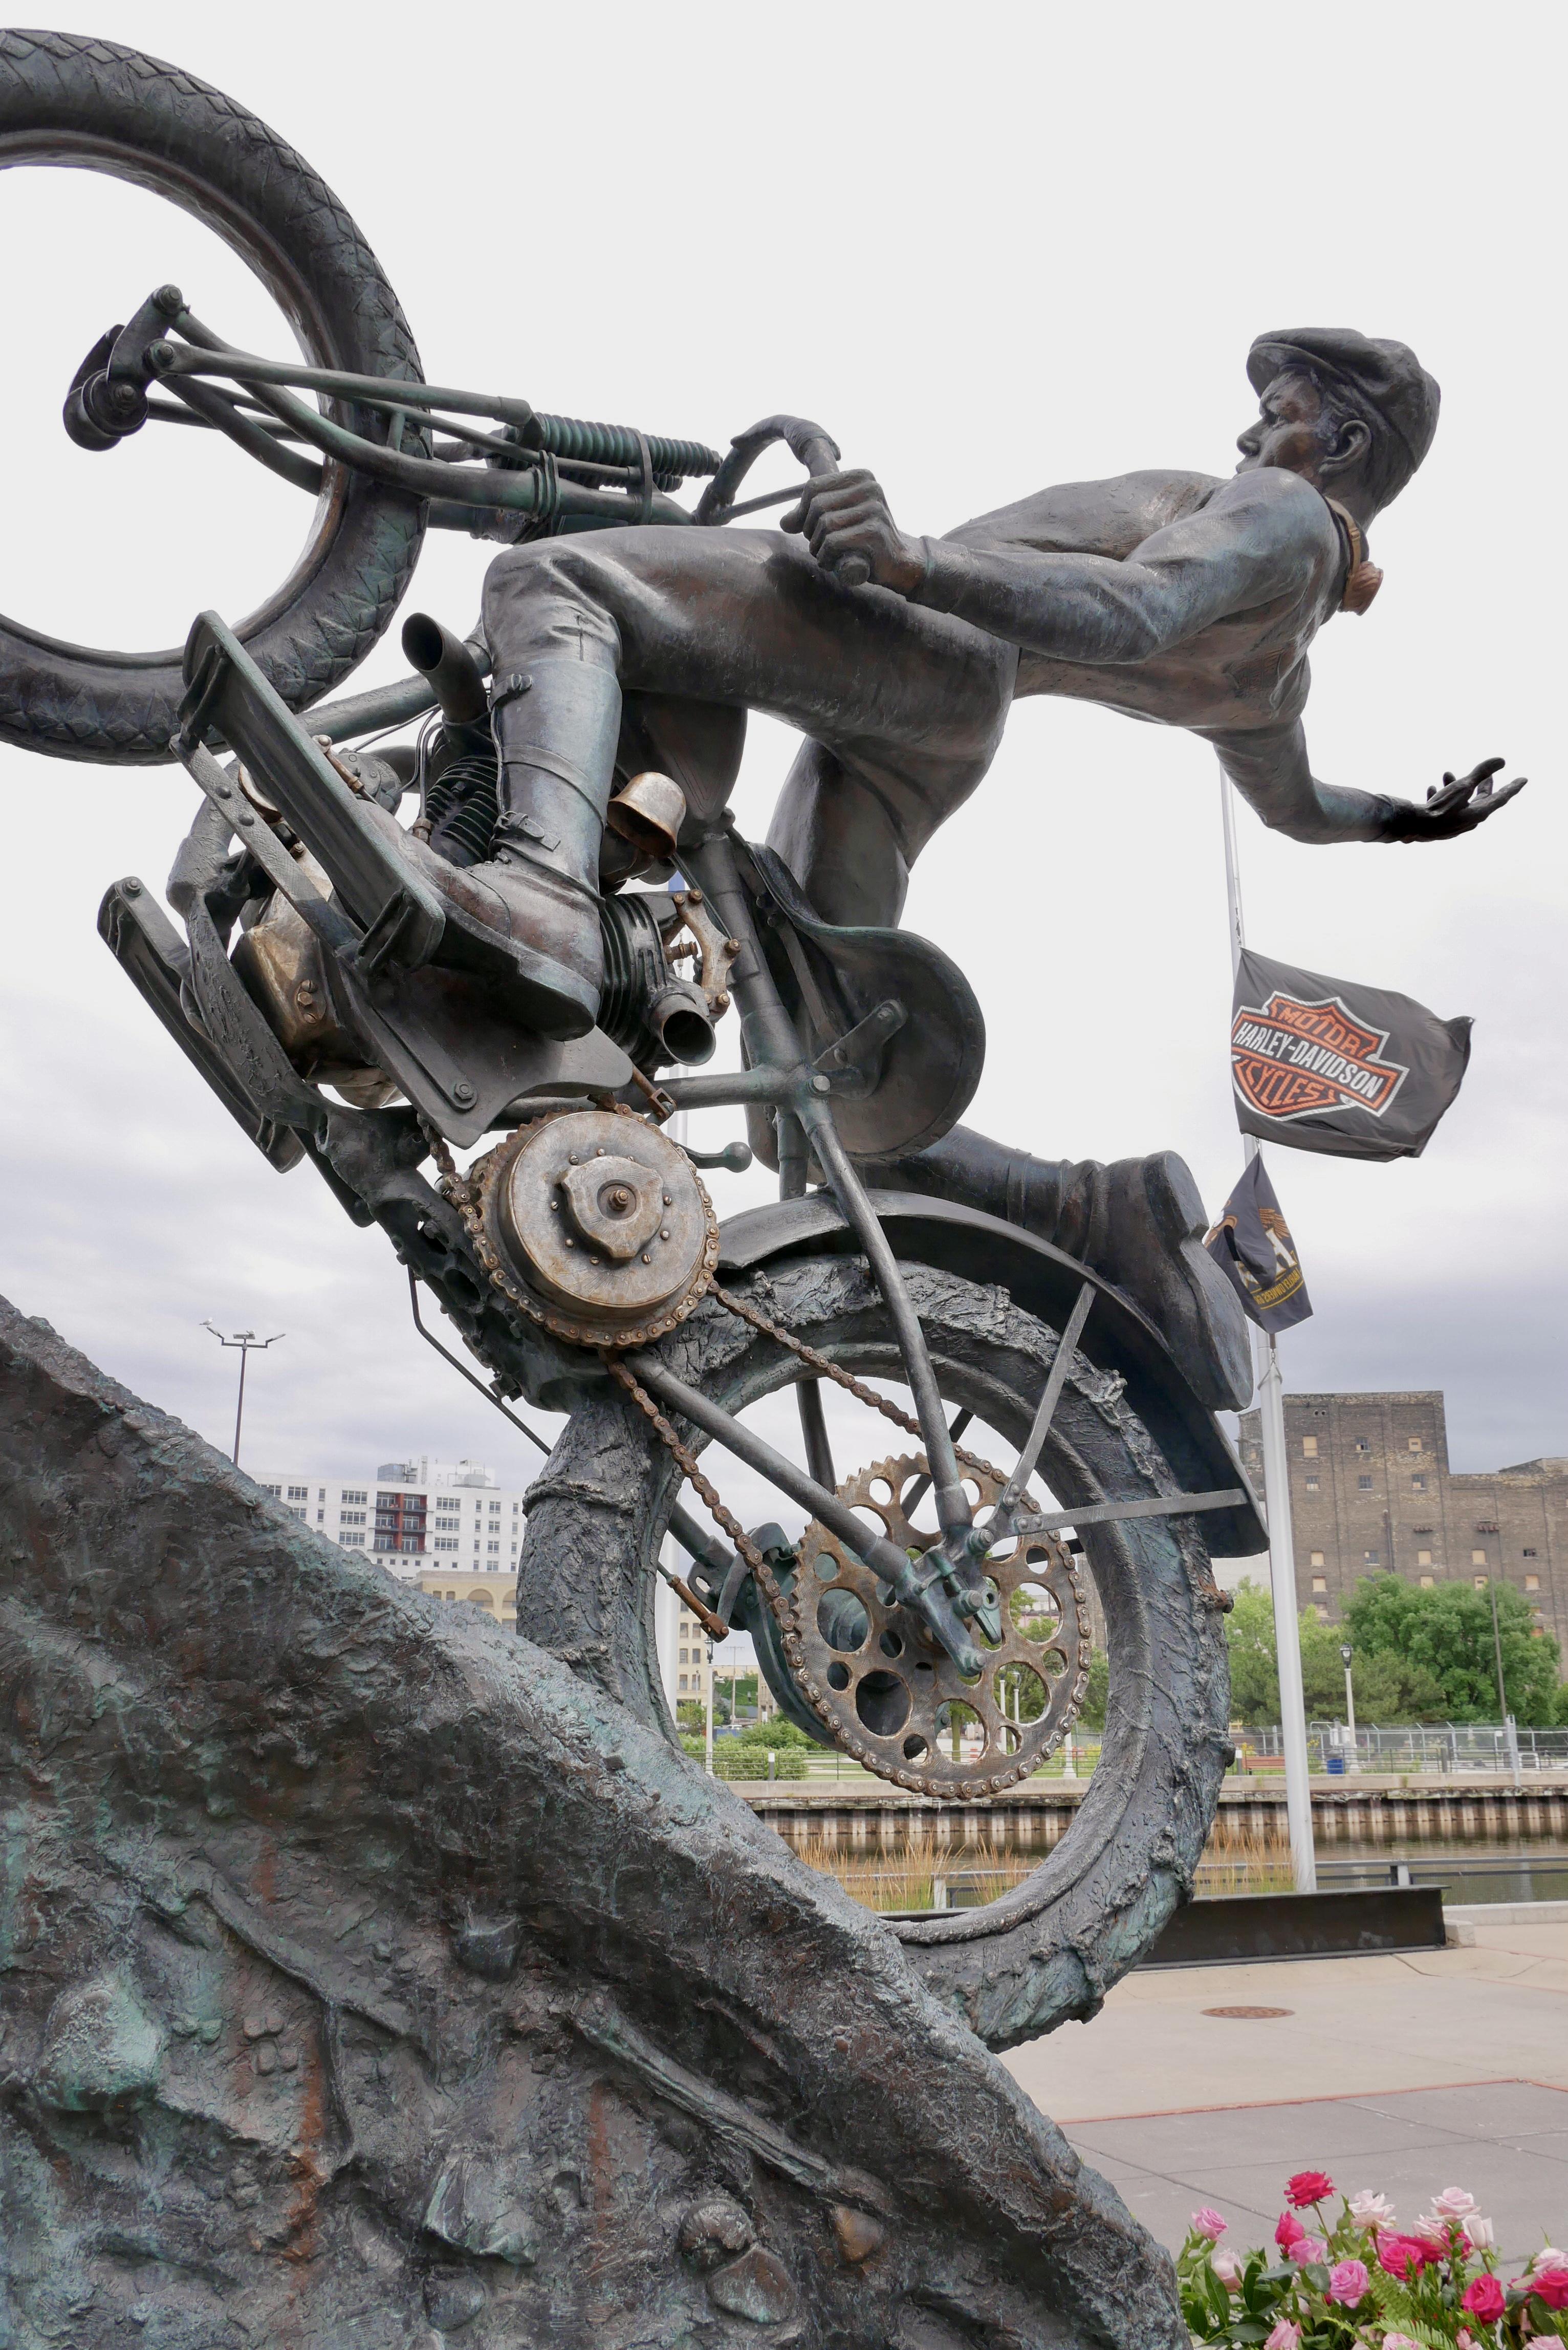 Harley Davidson Museum statue